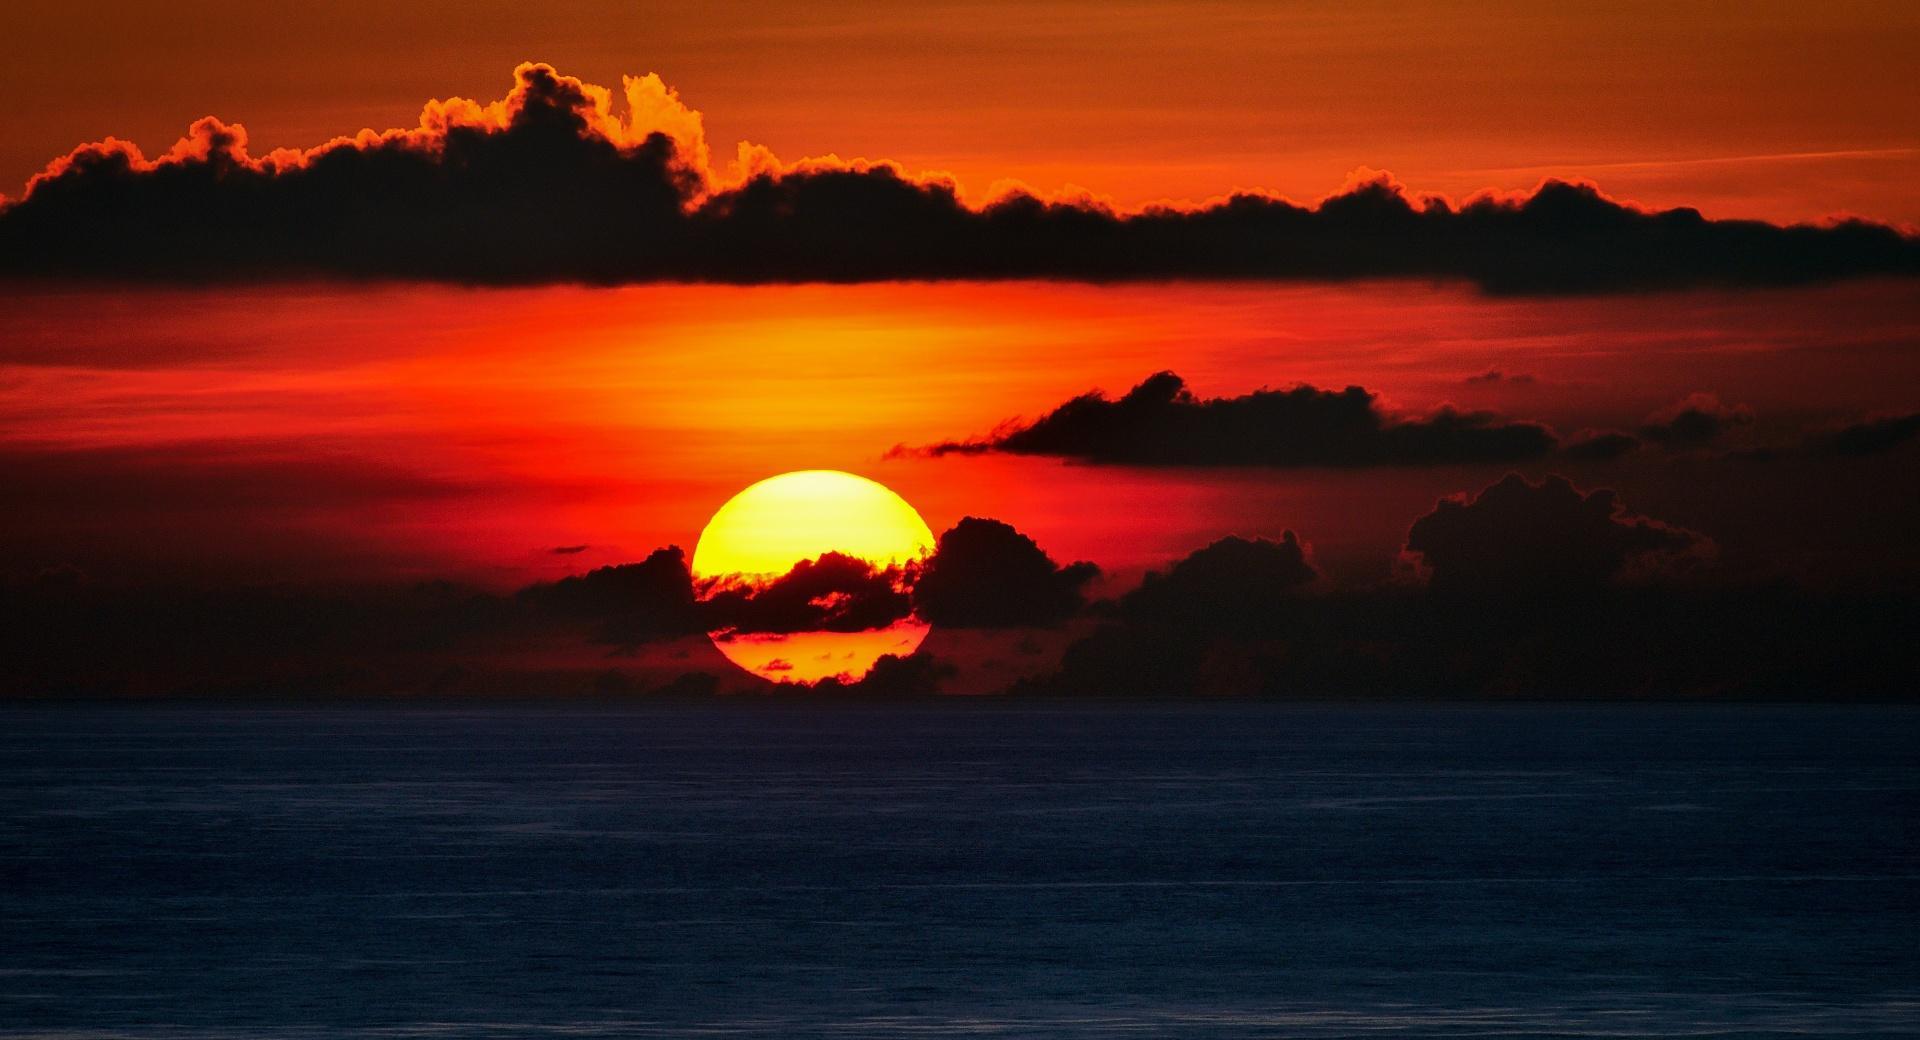 Red Sky, Big Sun Set wallpapers HD quality